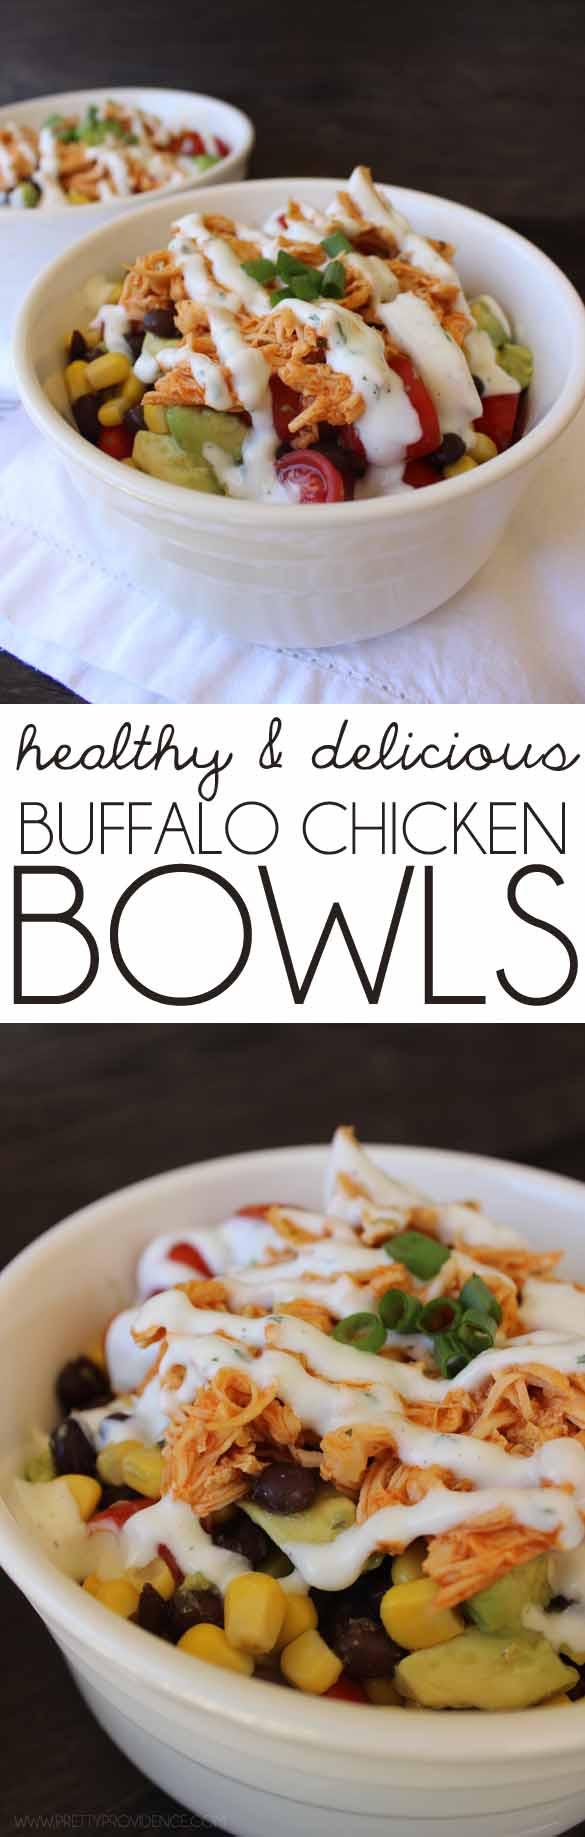 Healthy Buffalo Chicken Recipes  Healthy Buffalo Chicken Bowls